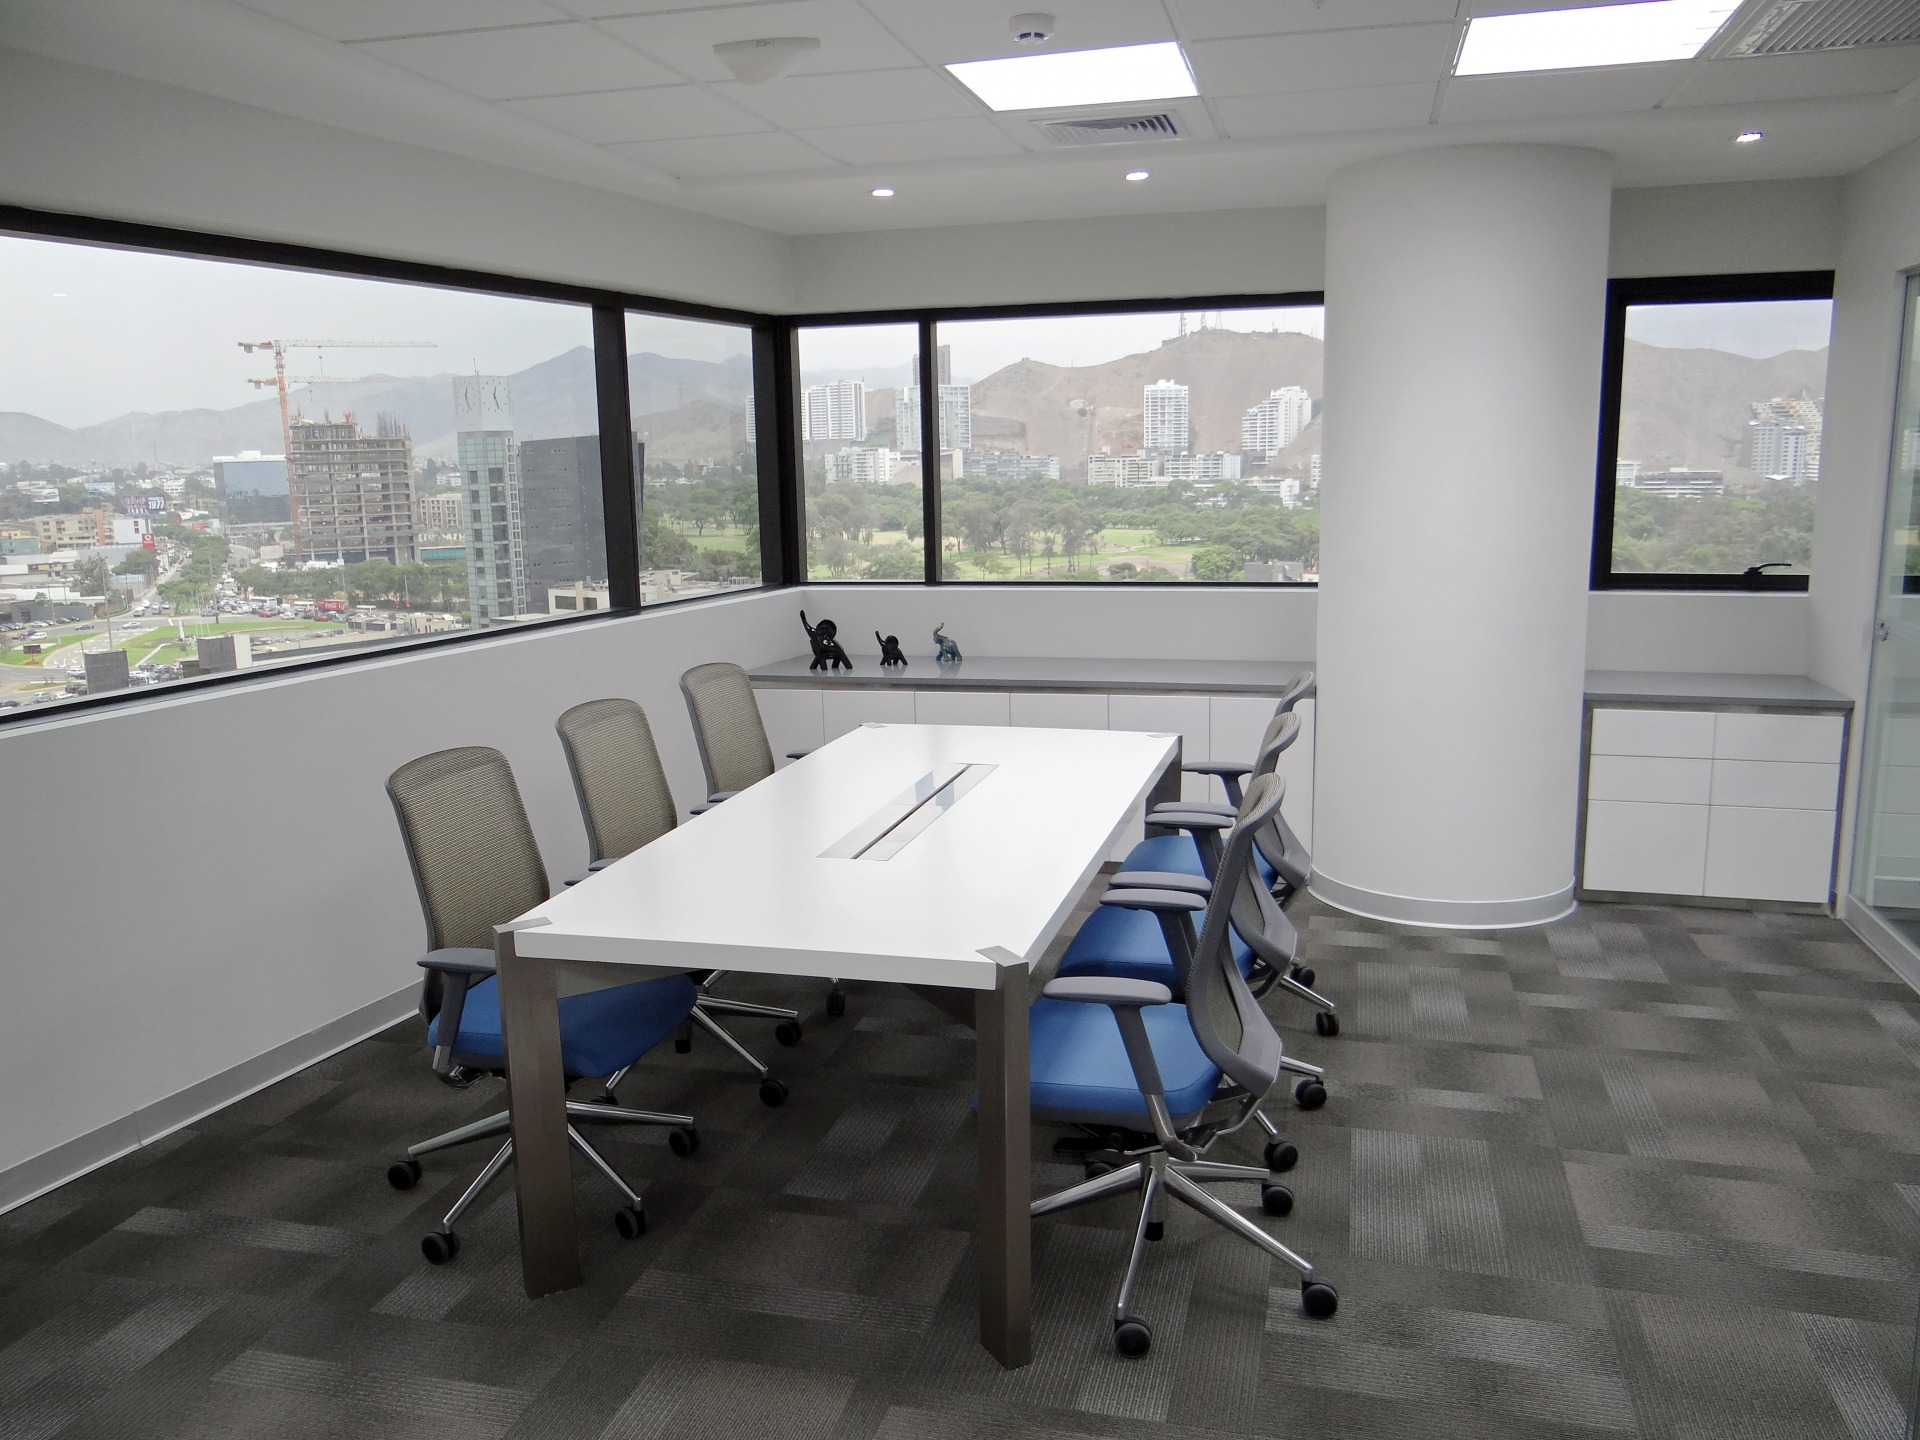 Peruvian S - Sala de reuniones A - Castellano